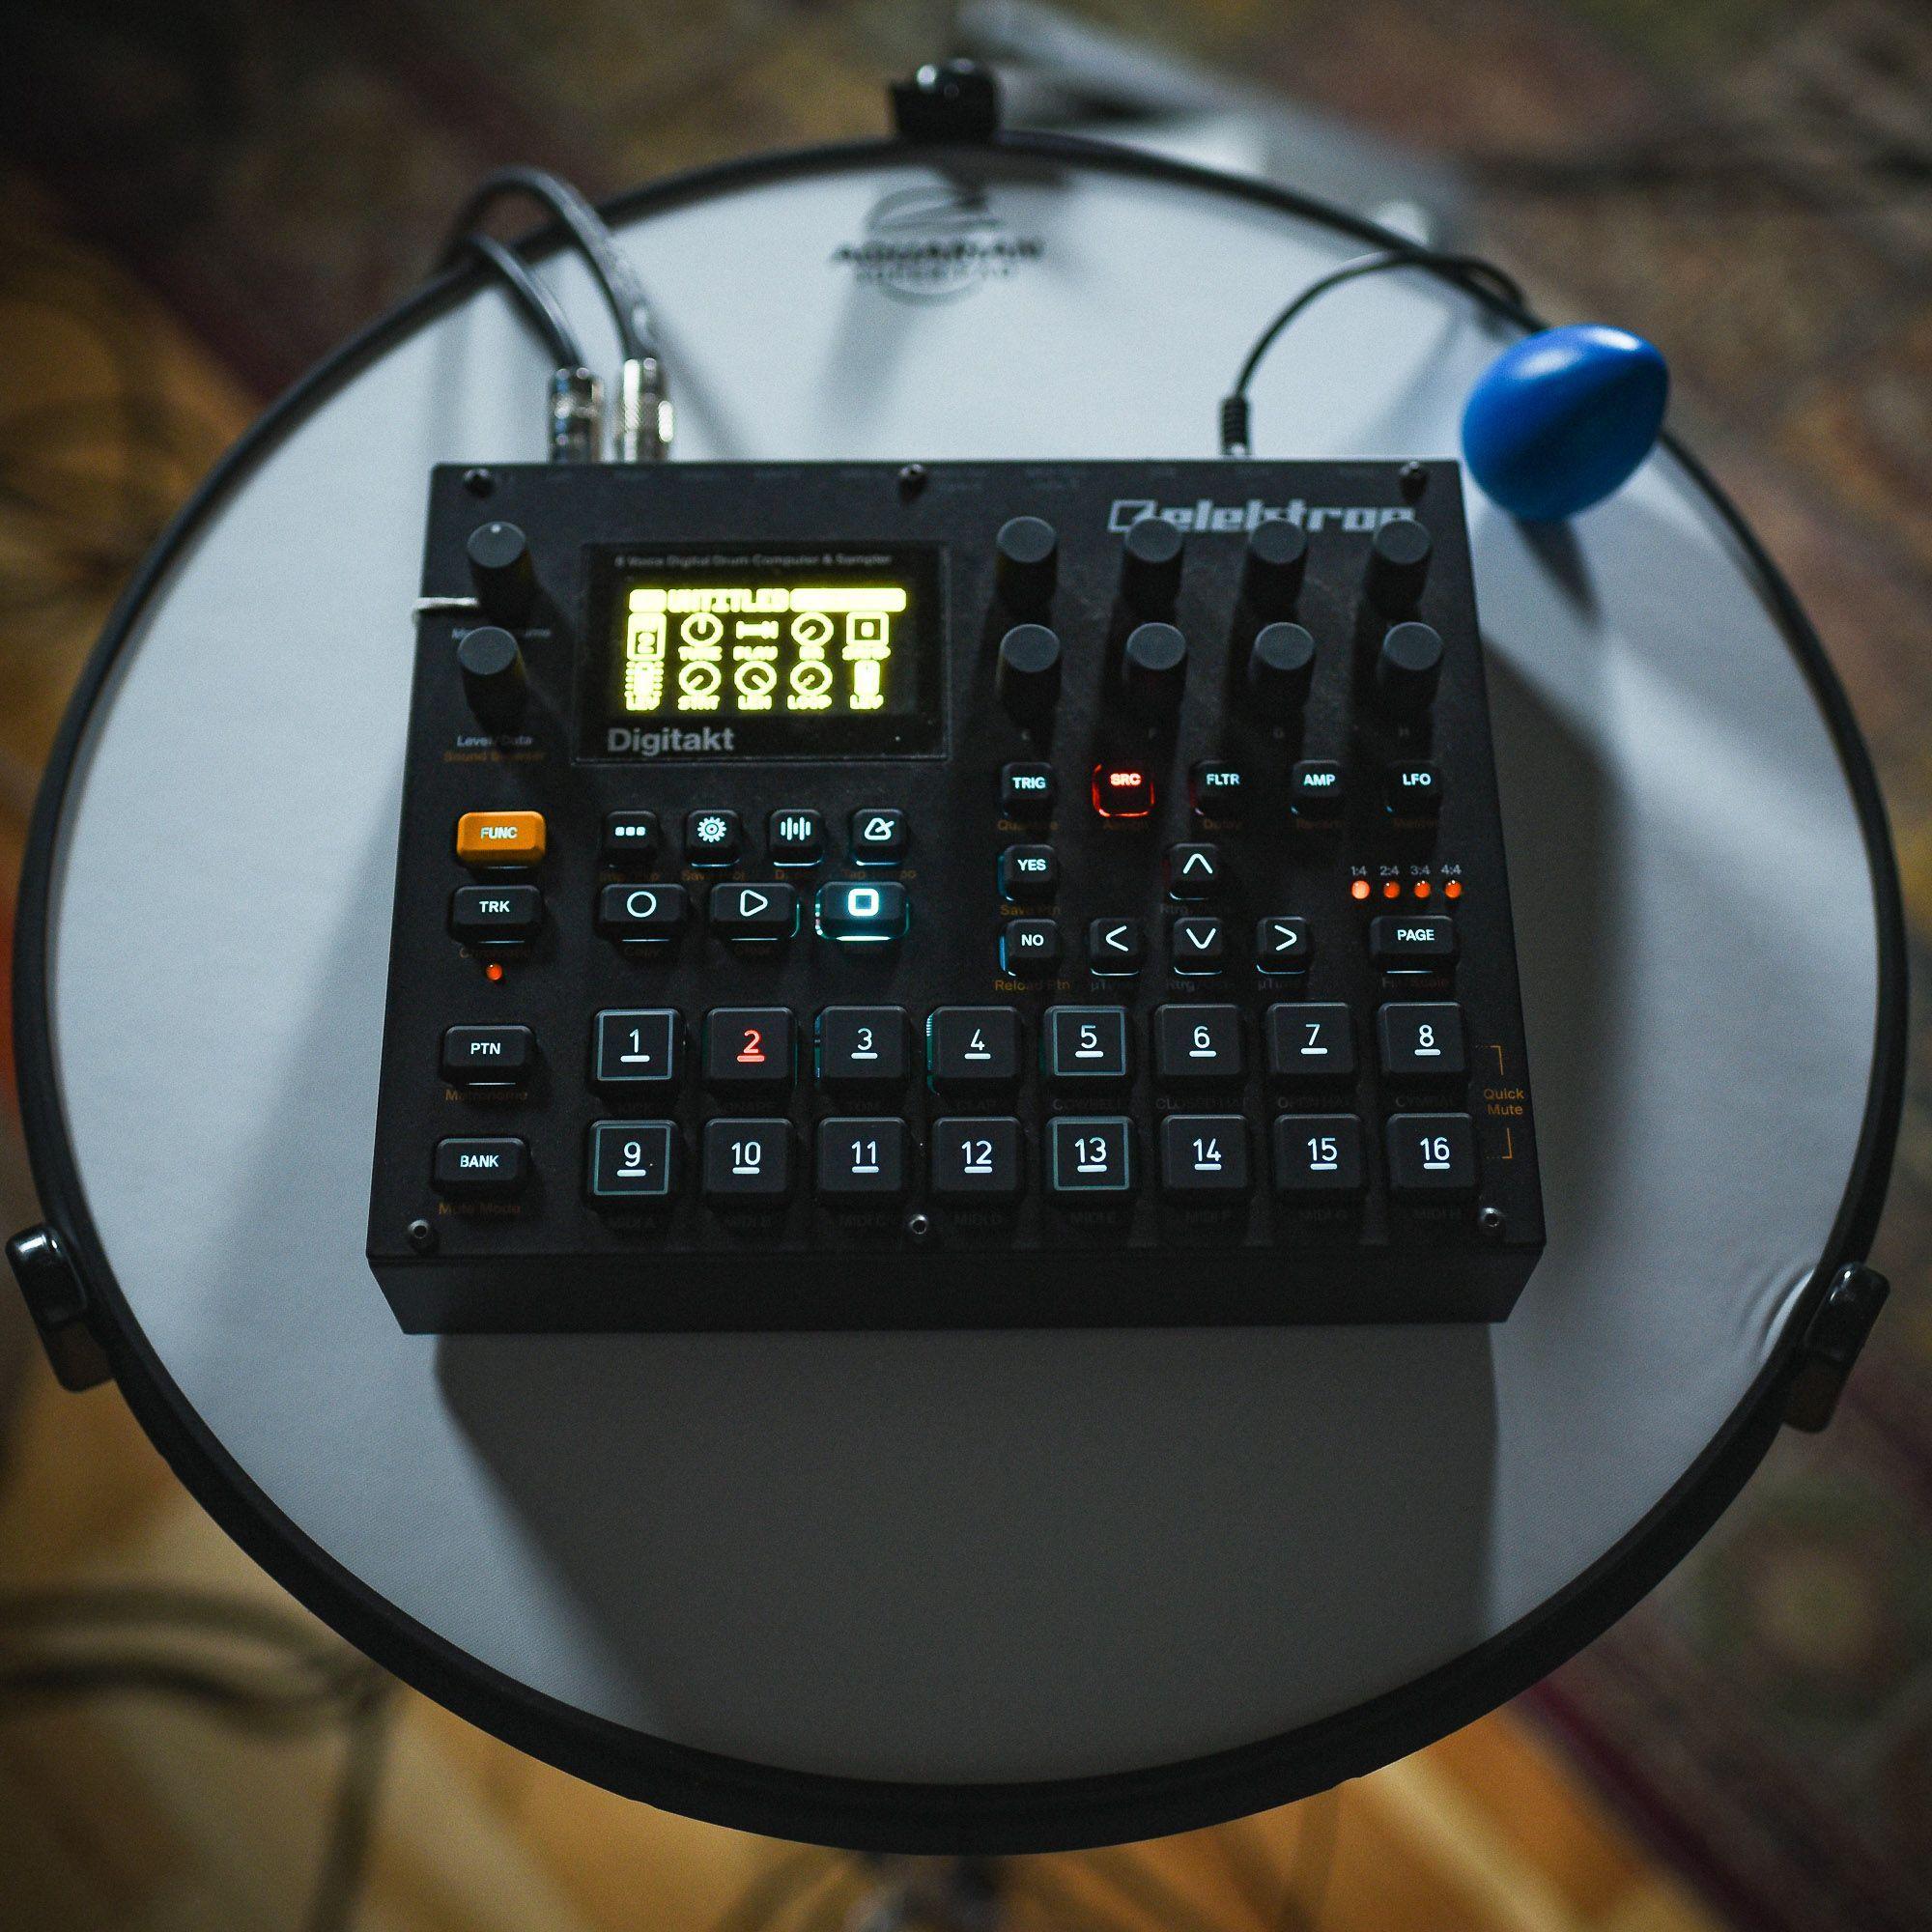 A wiredup weareelektron Digitakt drum machine. External